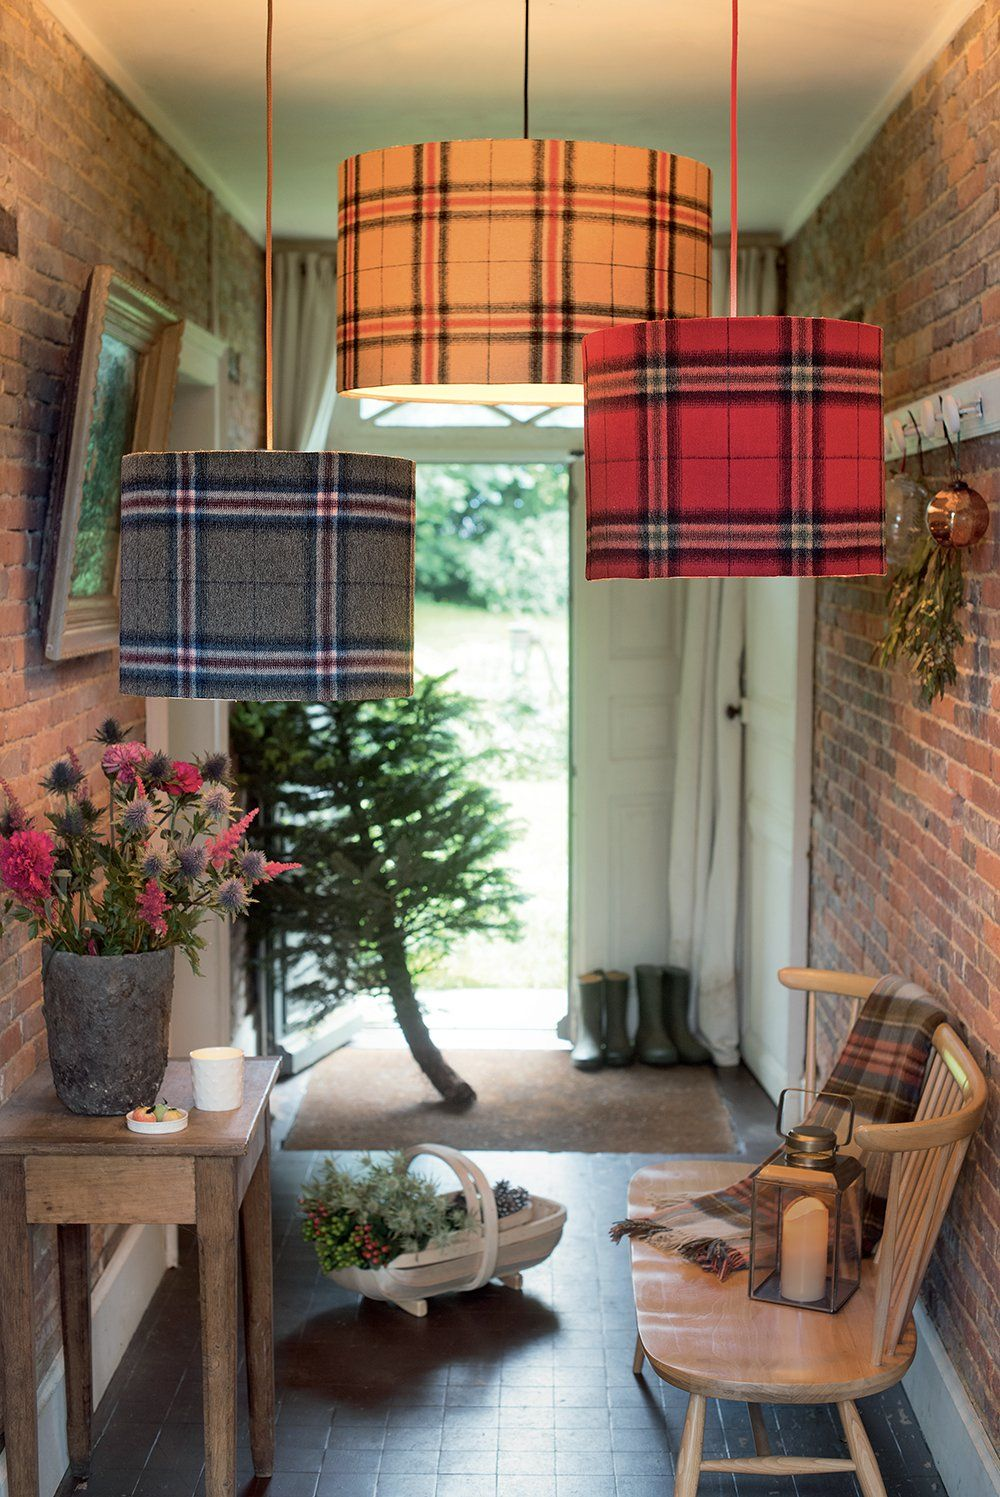 des suspensions lumineuses so british ! | décoration ecossaise